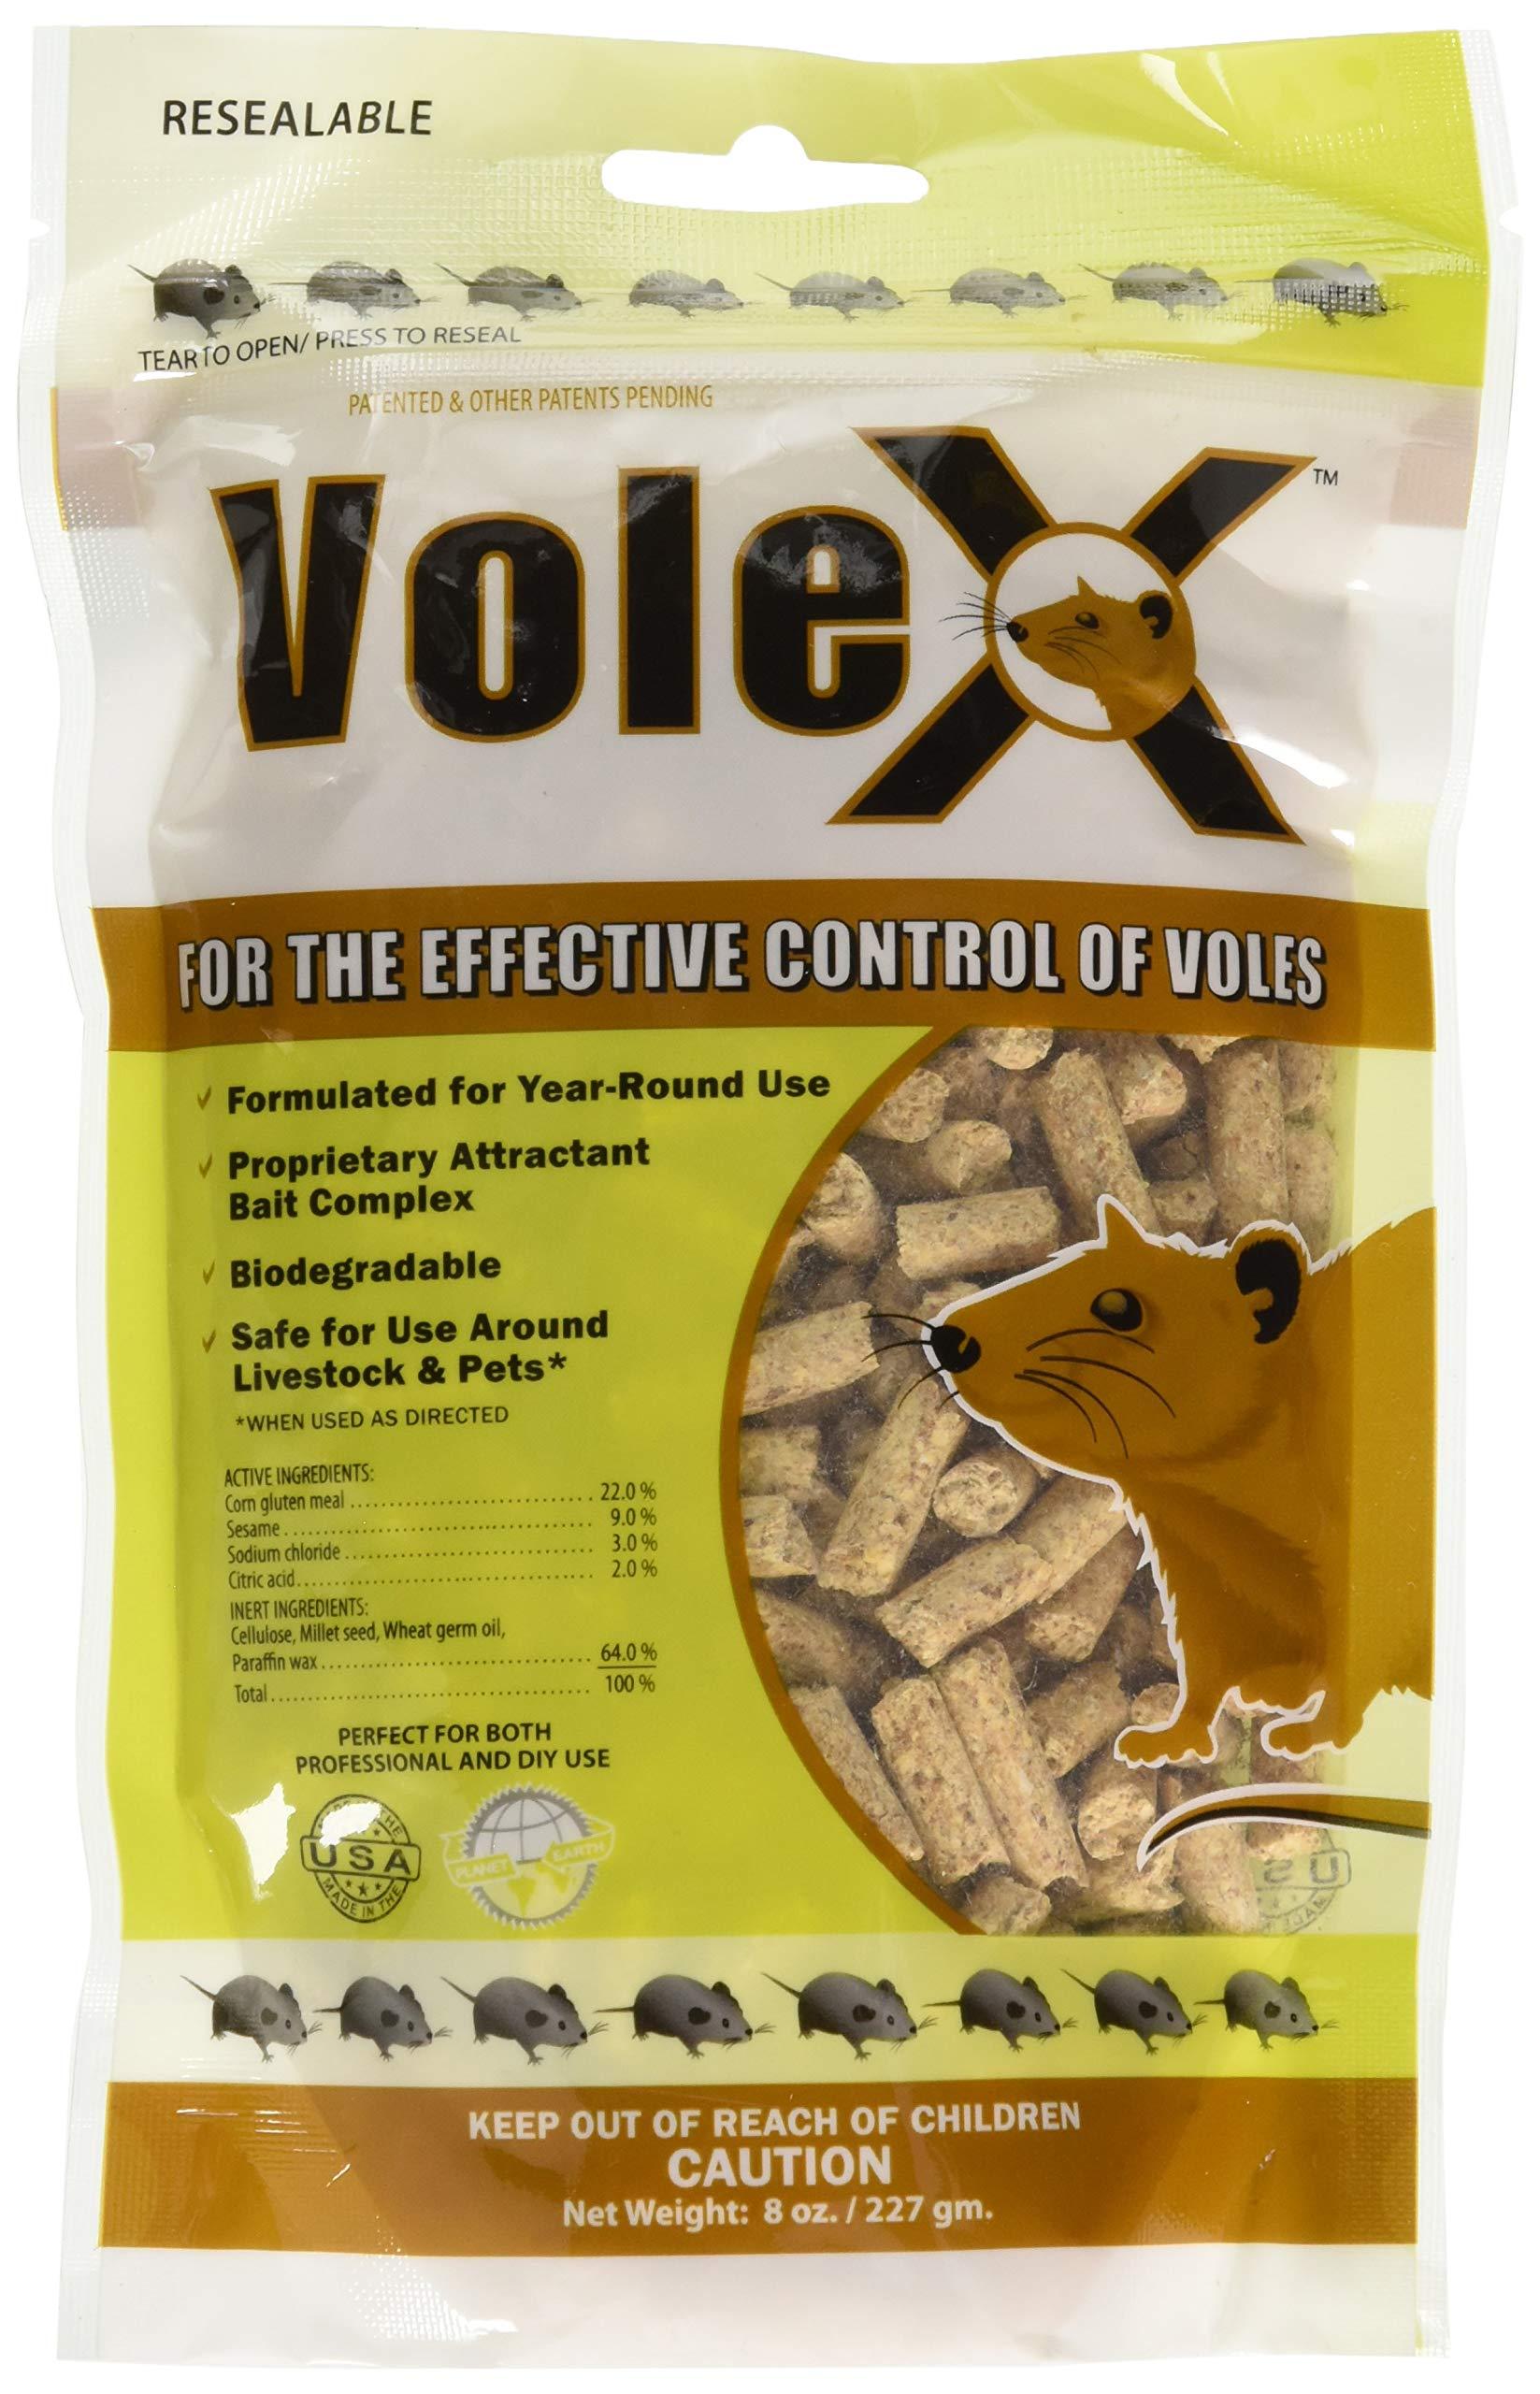 RatX EcoClear Products 620205, VoleX All-Natural Non-Toxic Humane Pellets, 8 oz. Bag Vole Killer by RatX